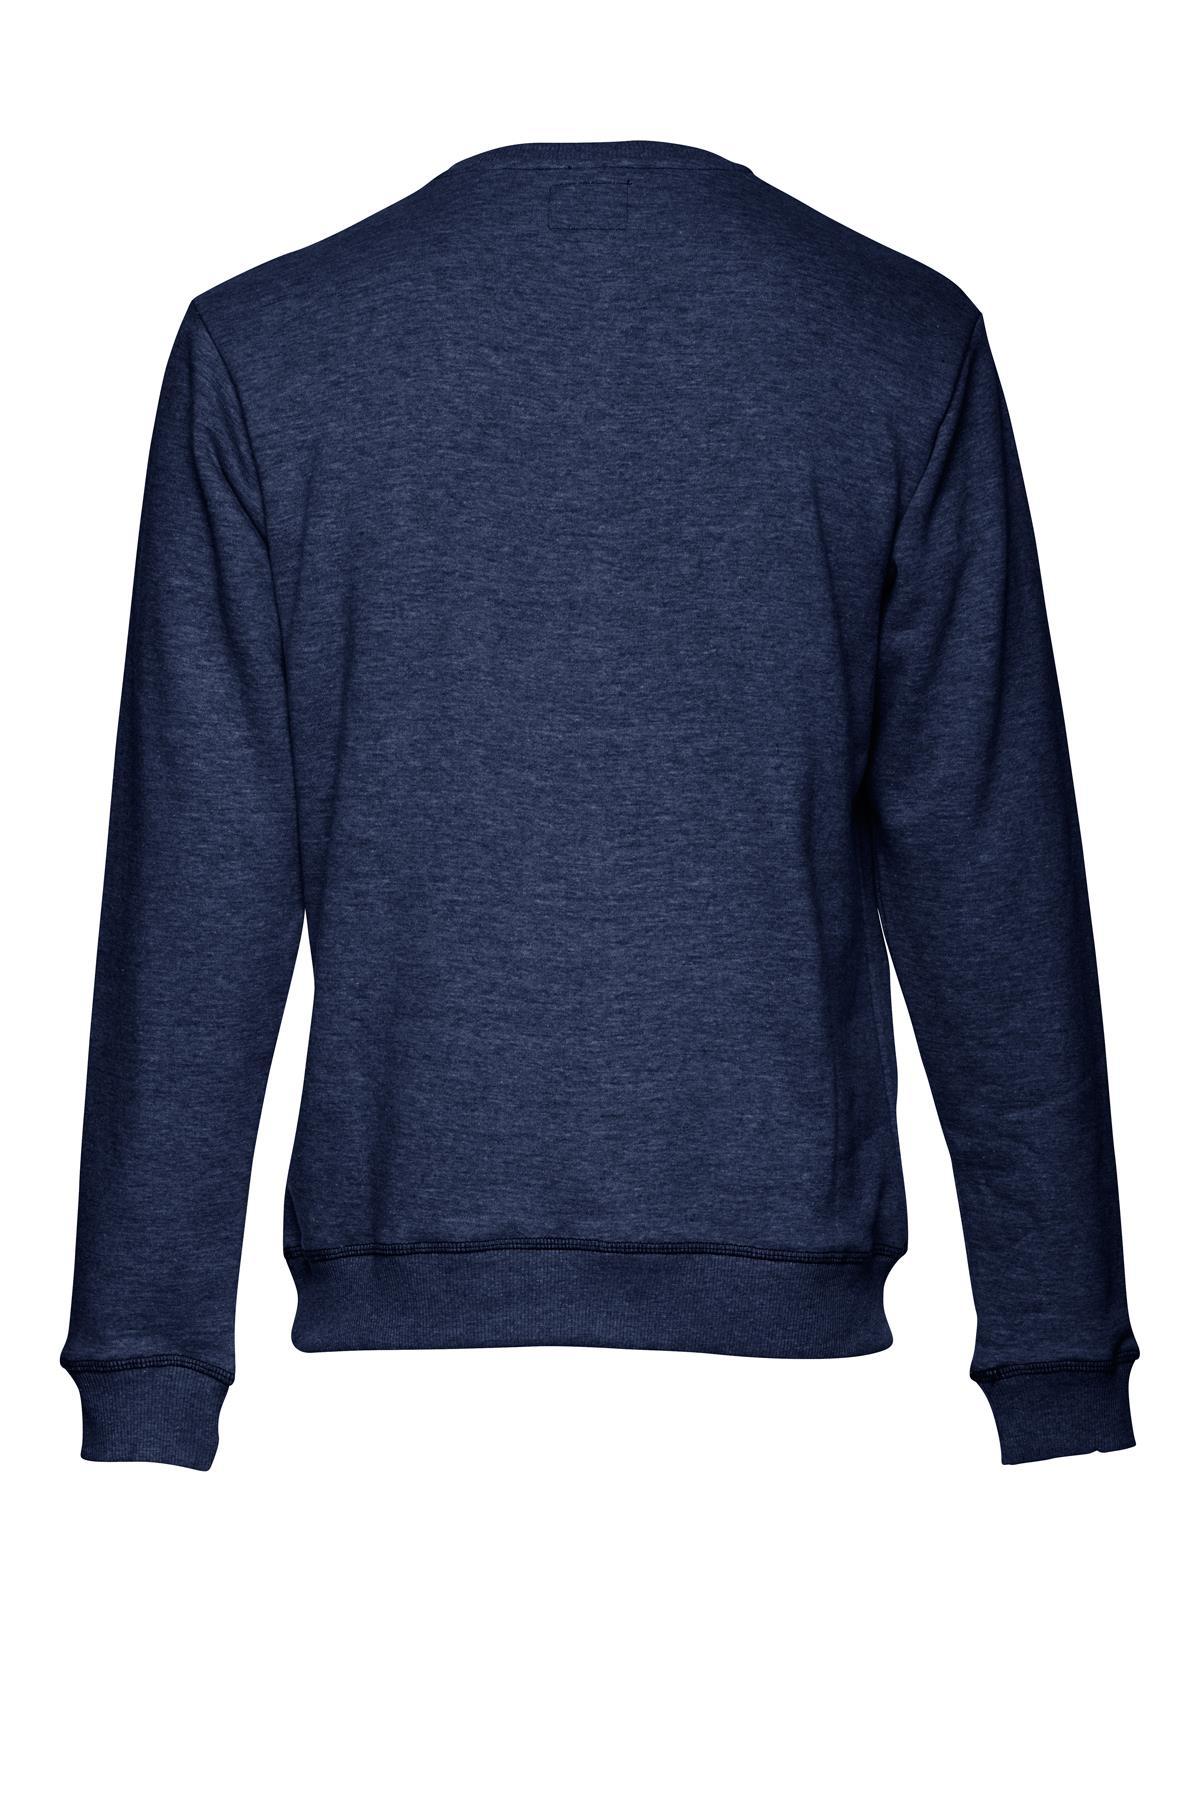 Marineblå Sweatshirt – Køb Marineblå Sweatshirt fra str. S-XL her